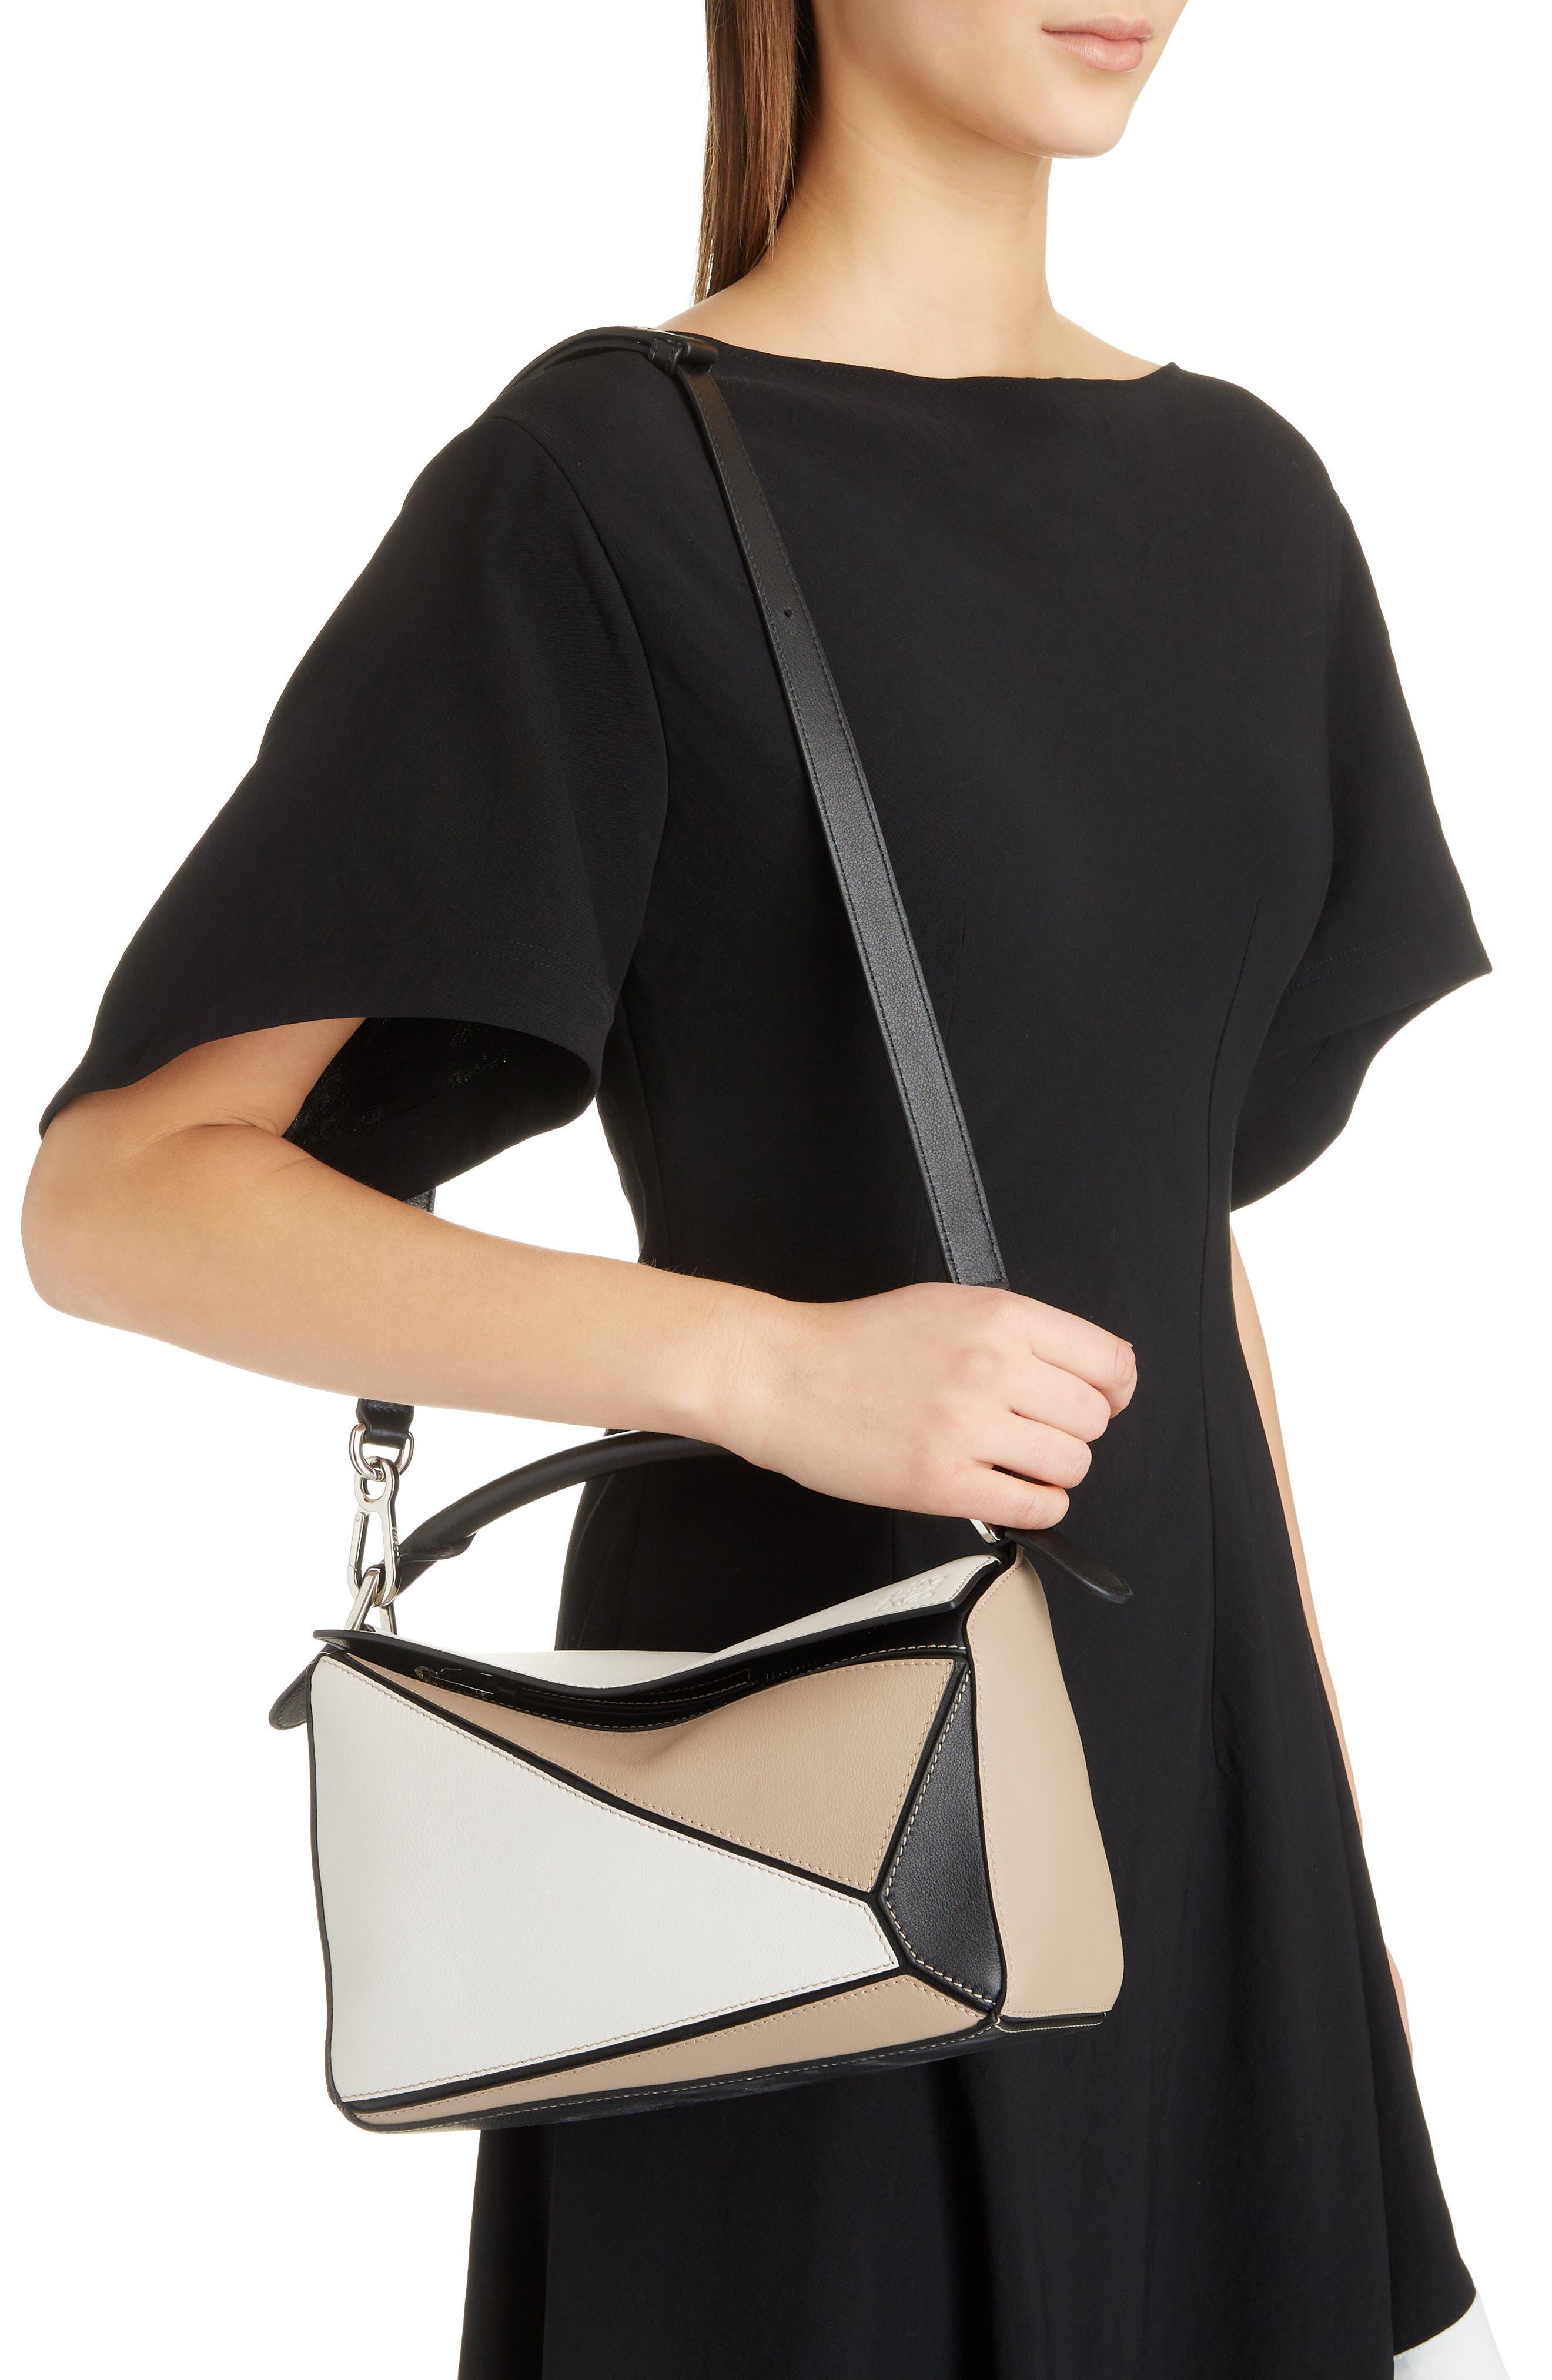 Puzzle Calfskin Leather Bag,                             Alternate thumbnail 2, color,                             176